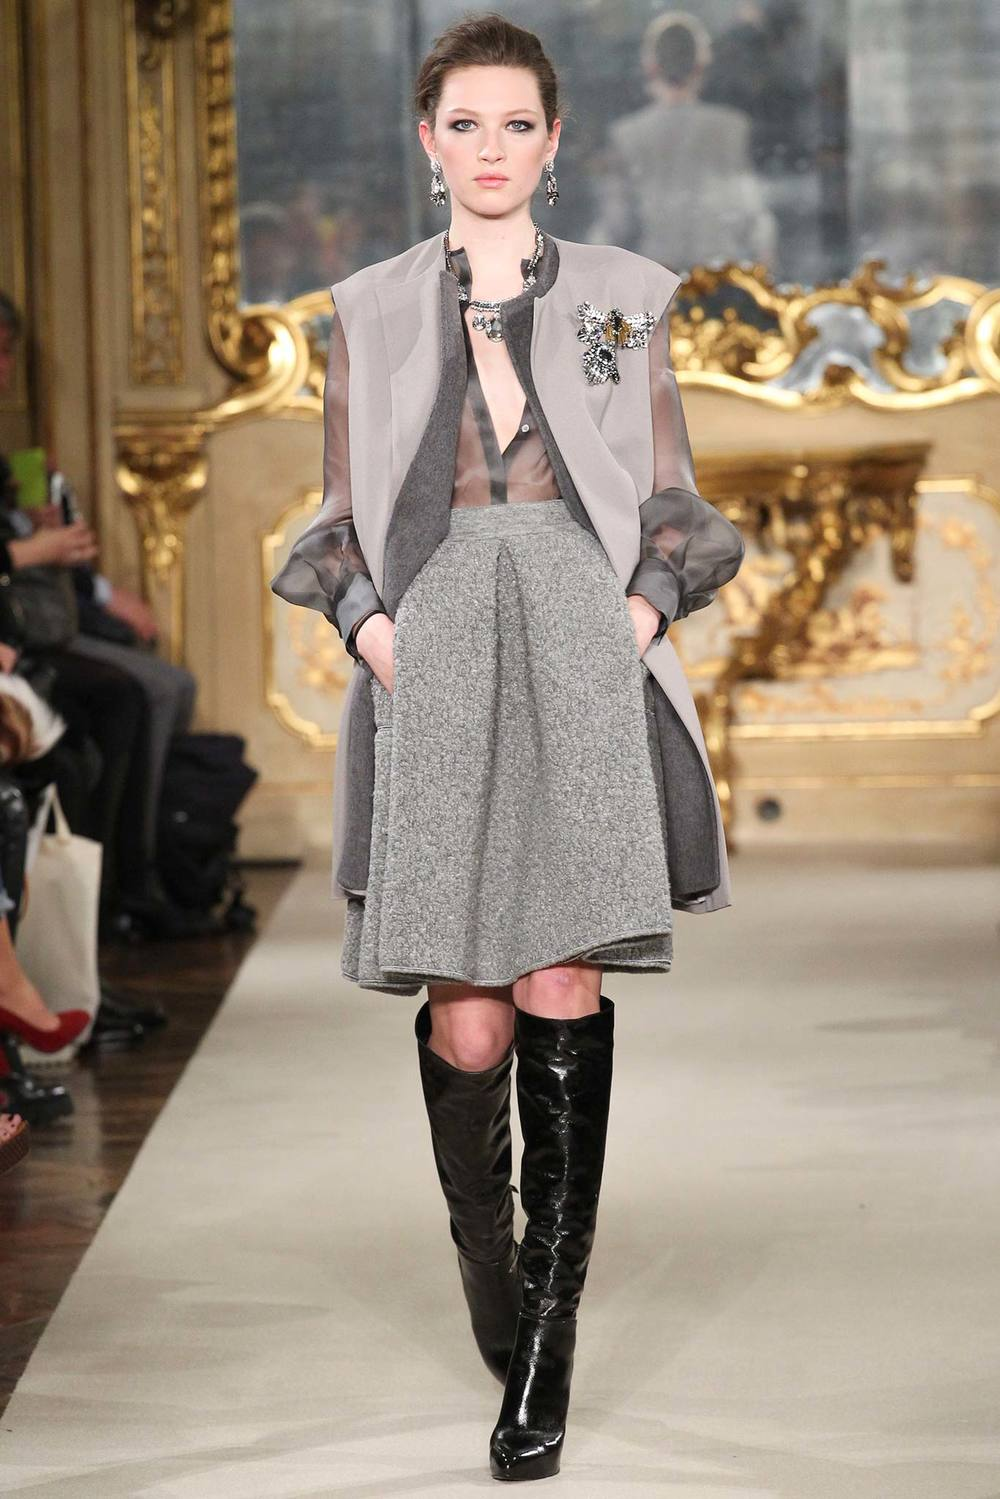 Les Copains Skirt Fall 2015